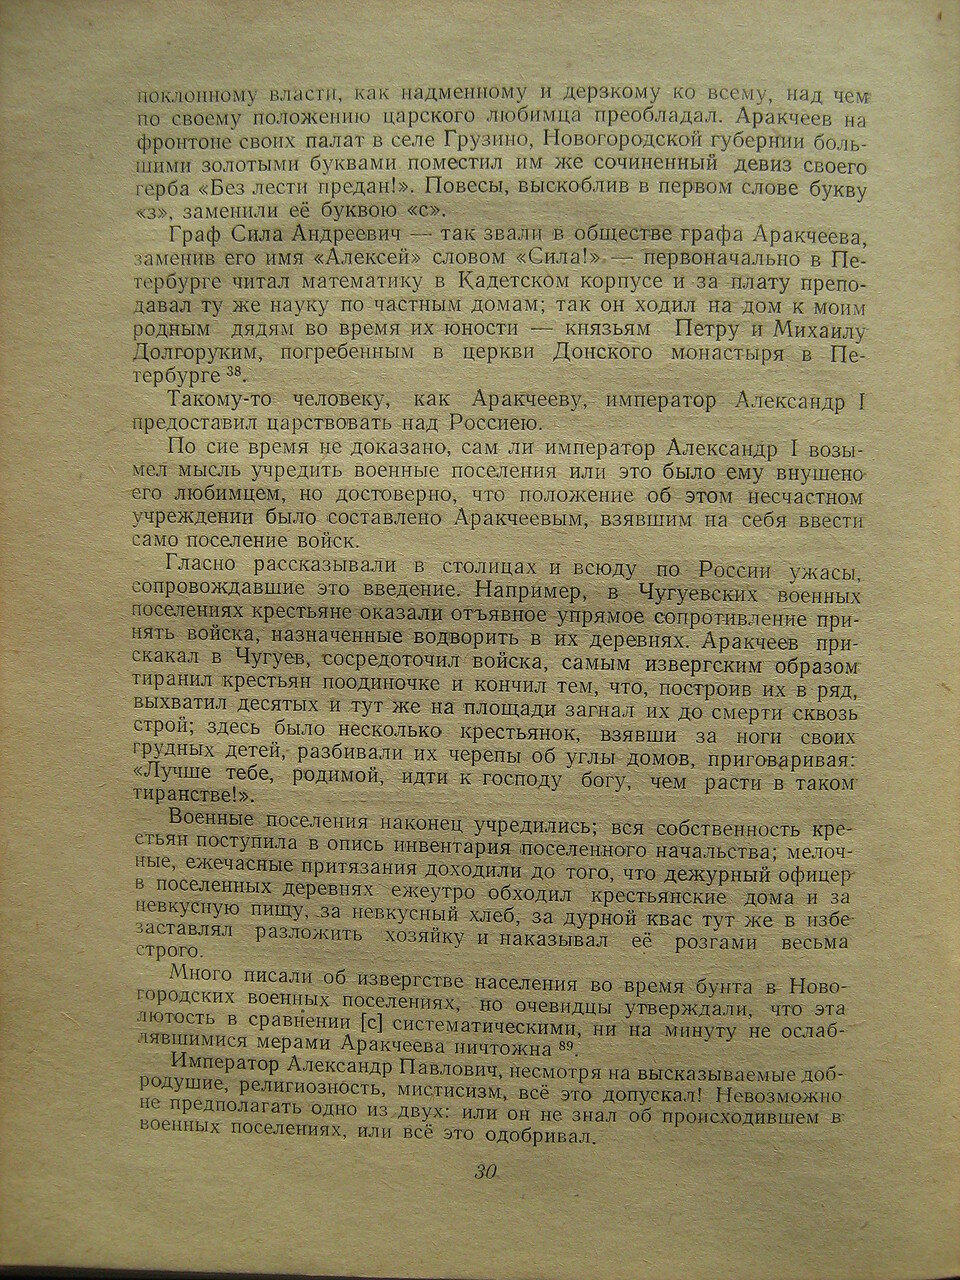 https://img-fotki.yandex.ru/get/914553/199368979.df/0_21f74c_239dc3a_XXXL.jpg